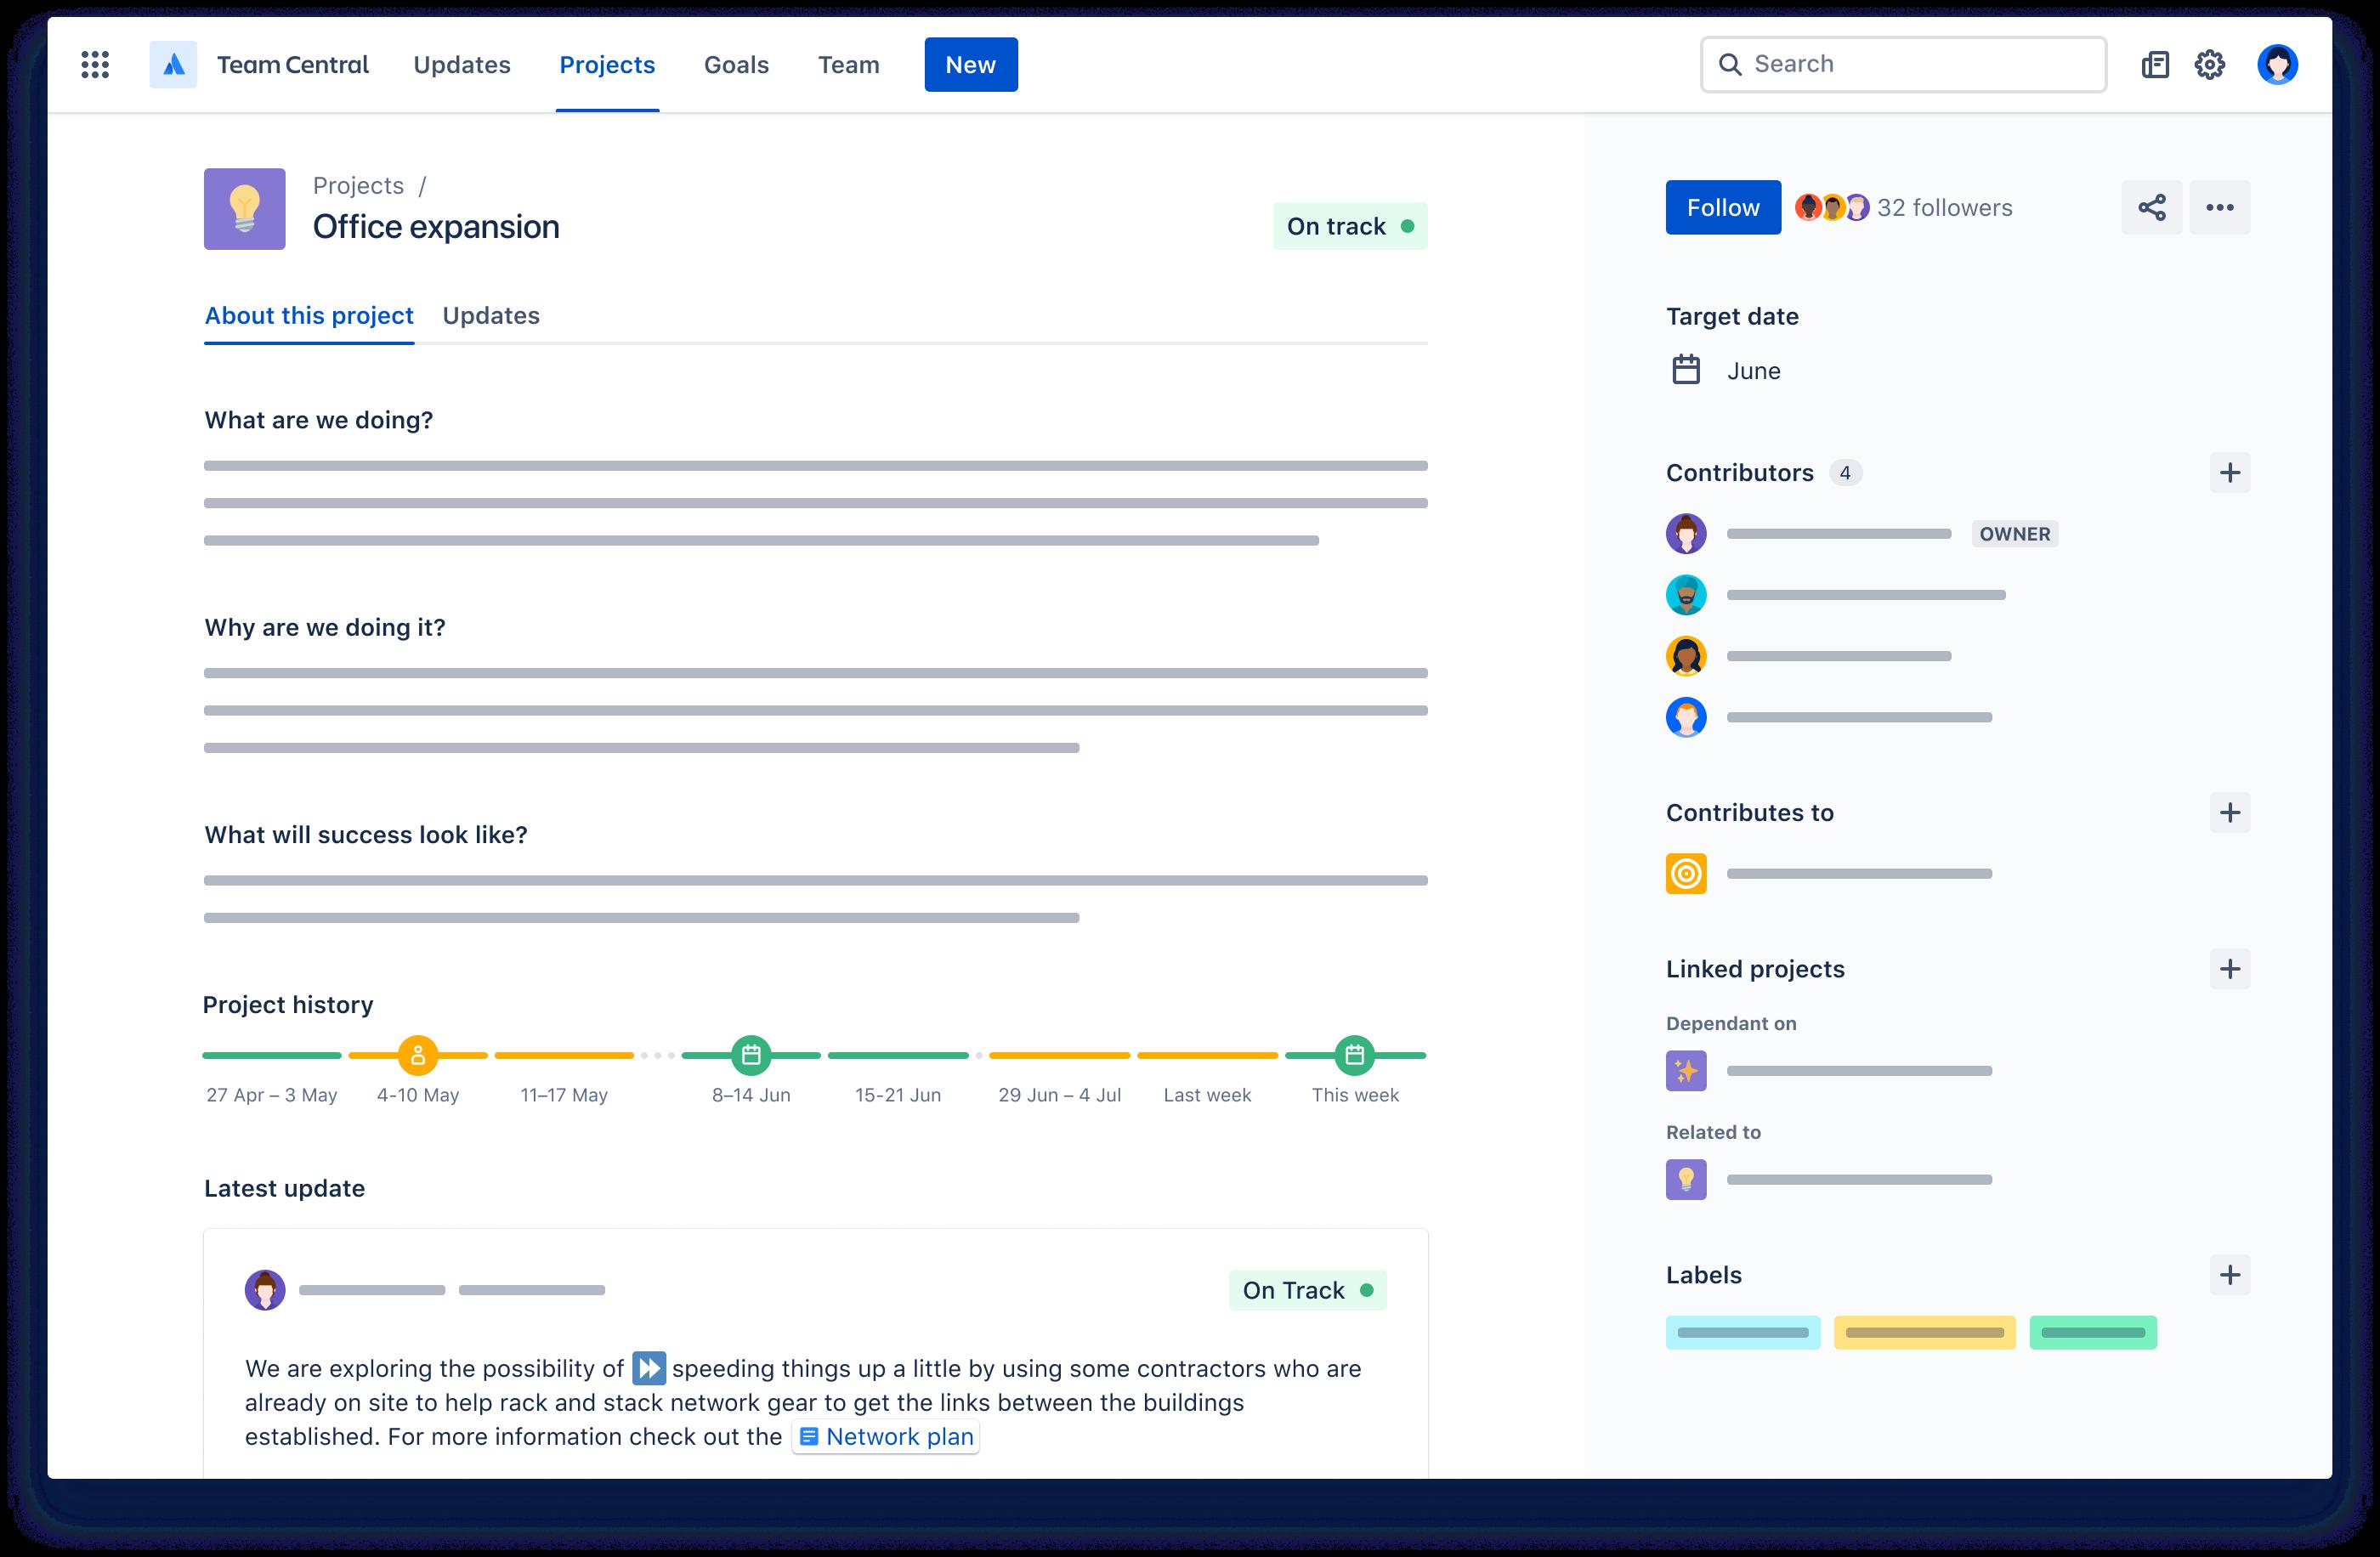 zrzut ekranu produktu